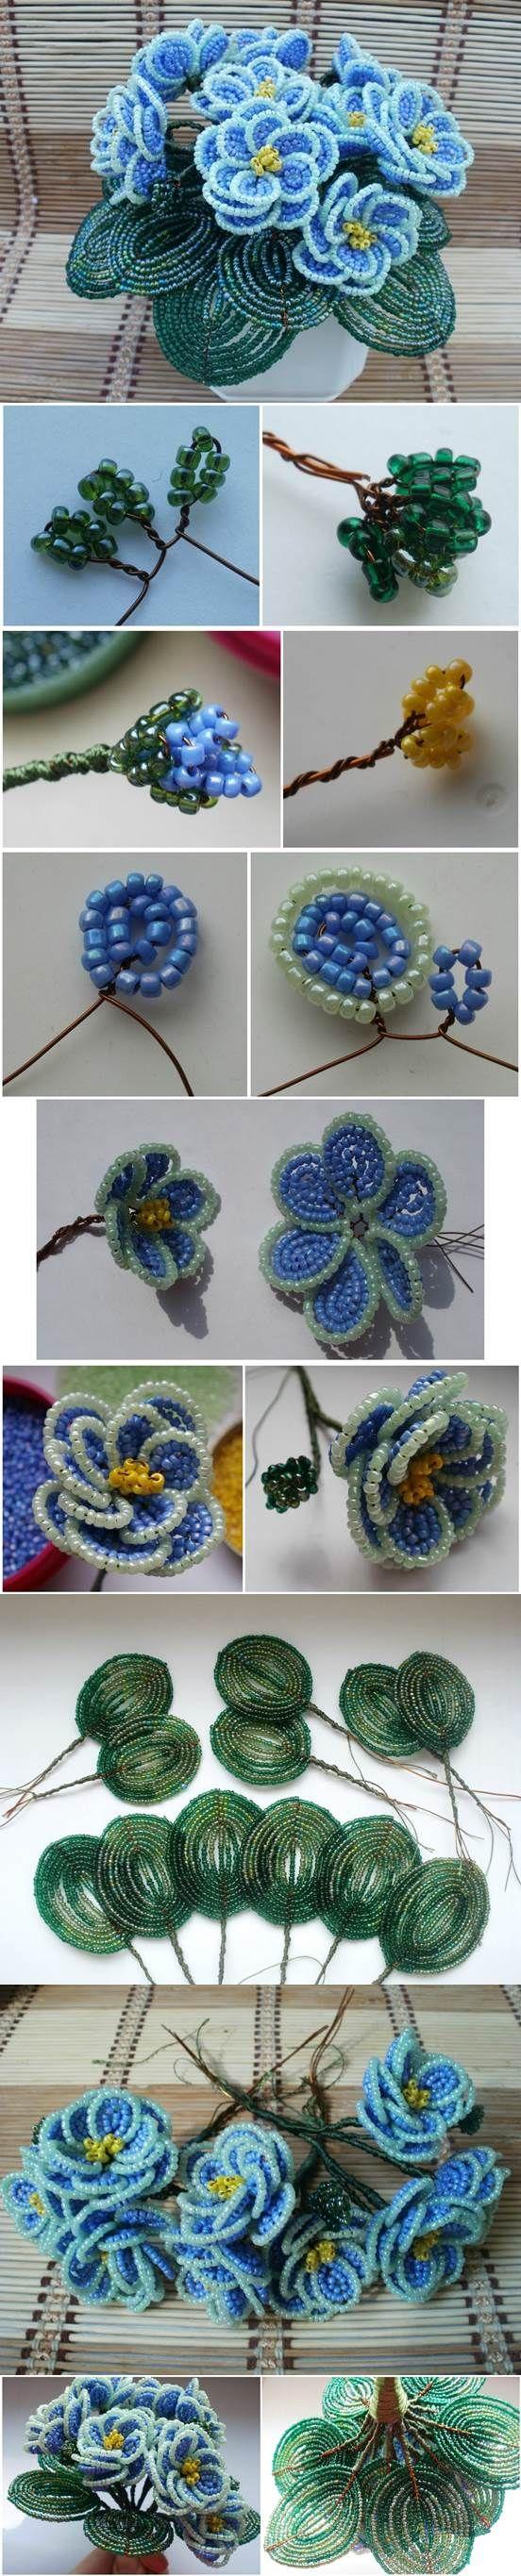 DIY Beaded Violet Flower Bouquet | iCreativeIdeas.com Like Us on Facebook ==> https://www.facebook.com/icreativeideas